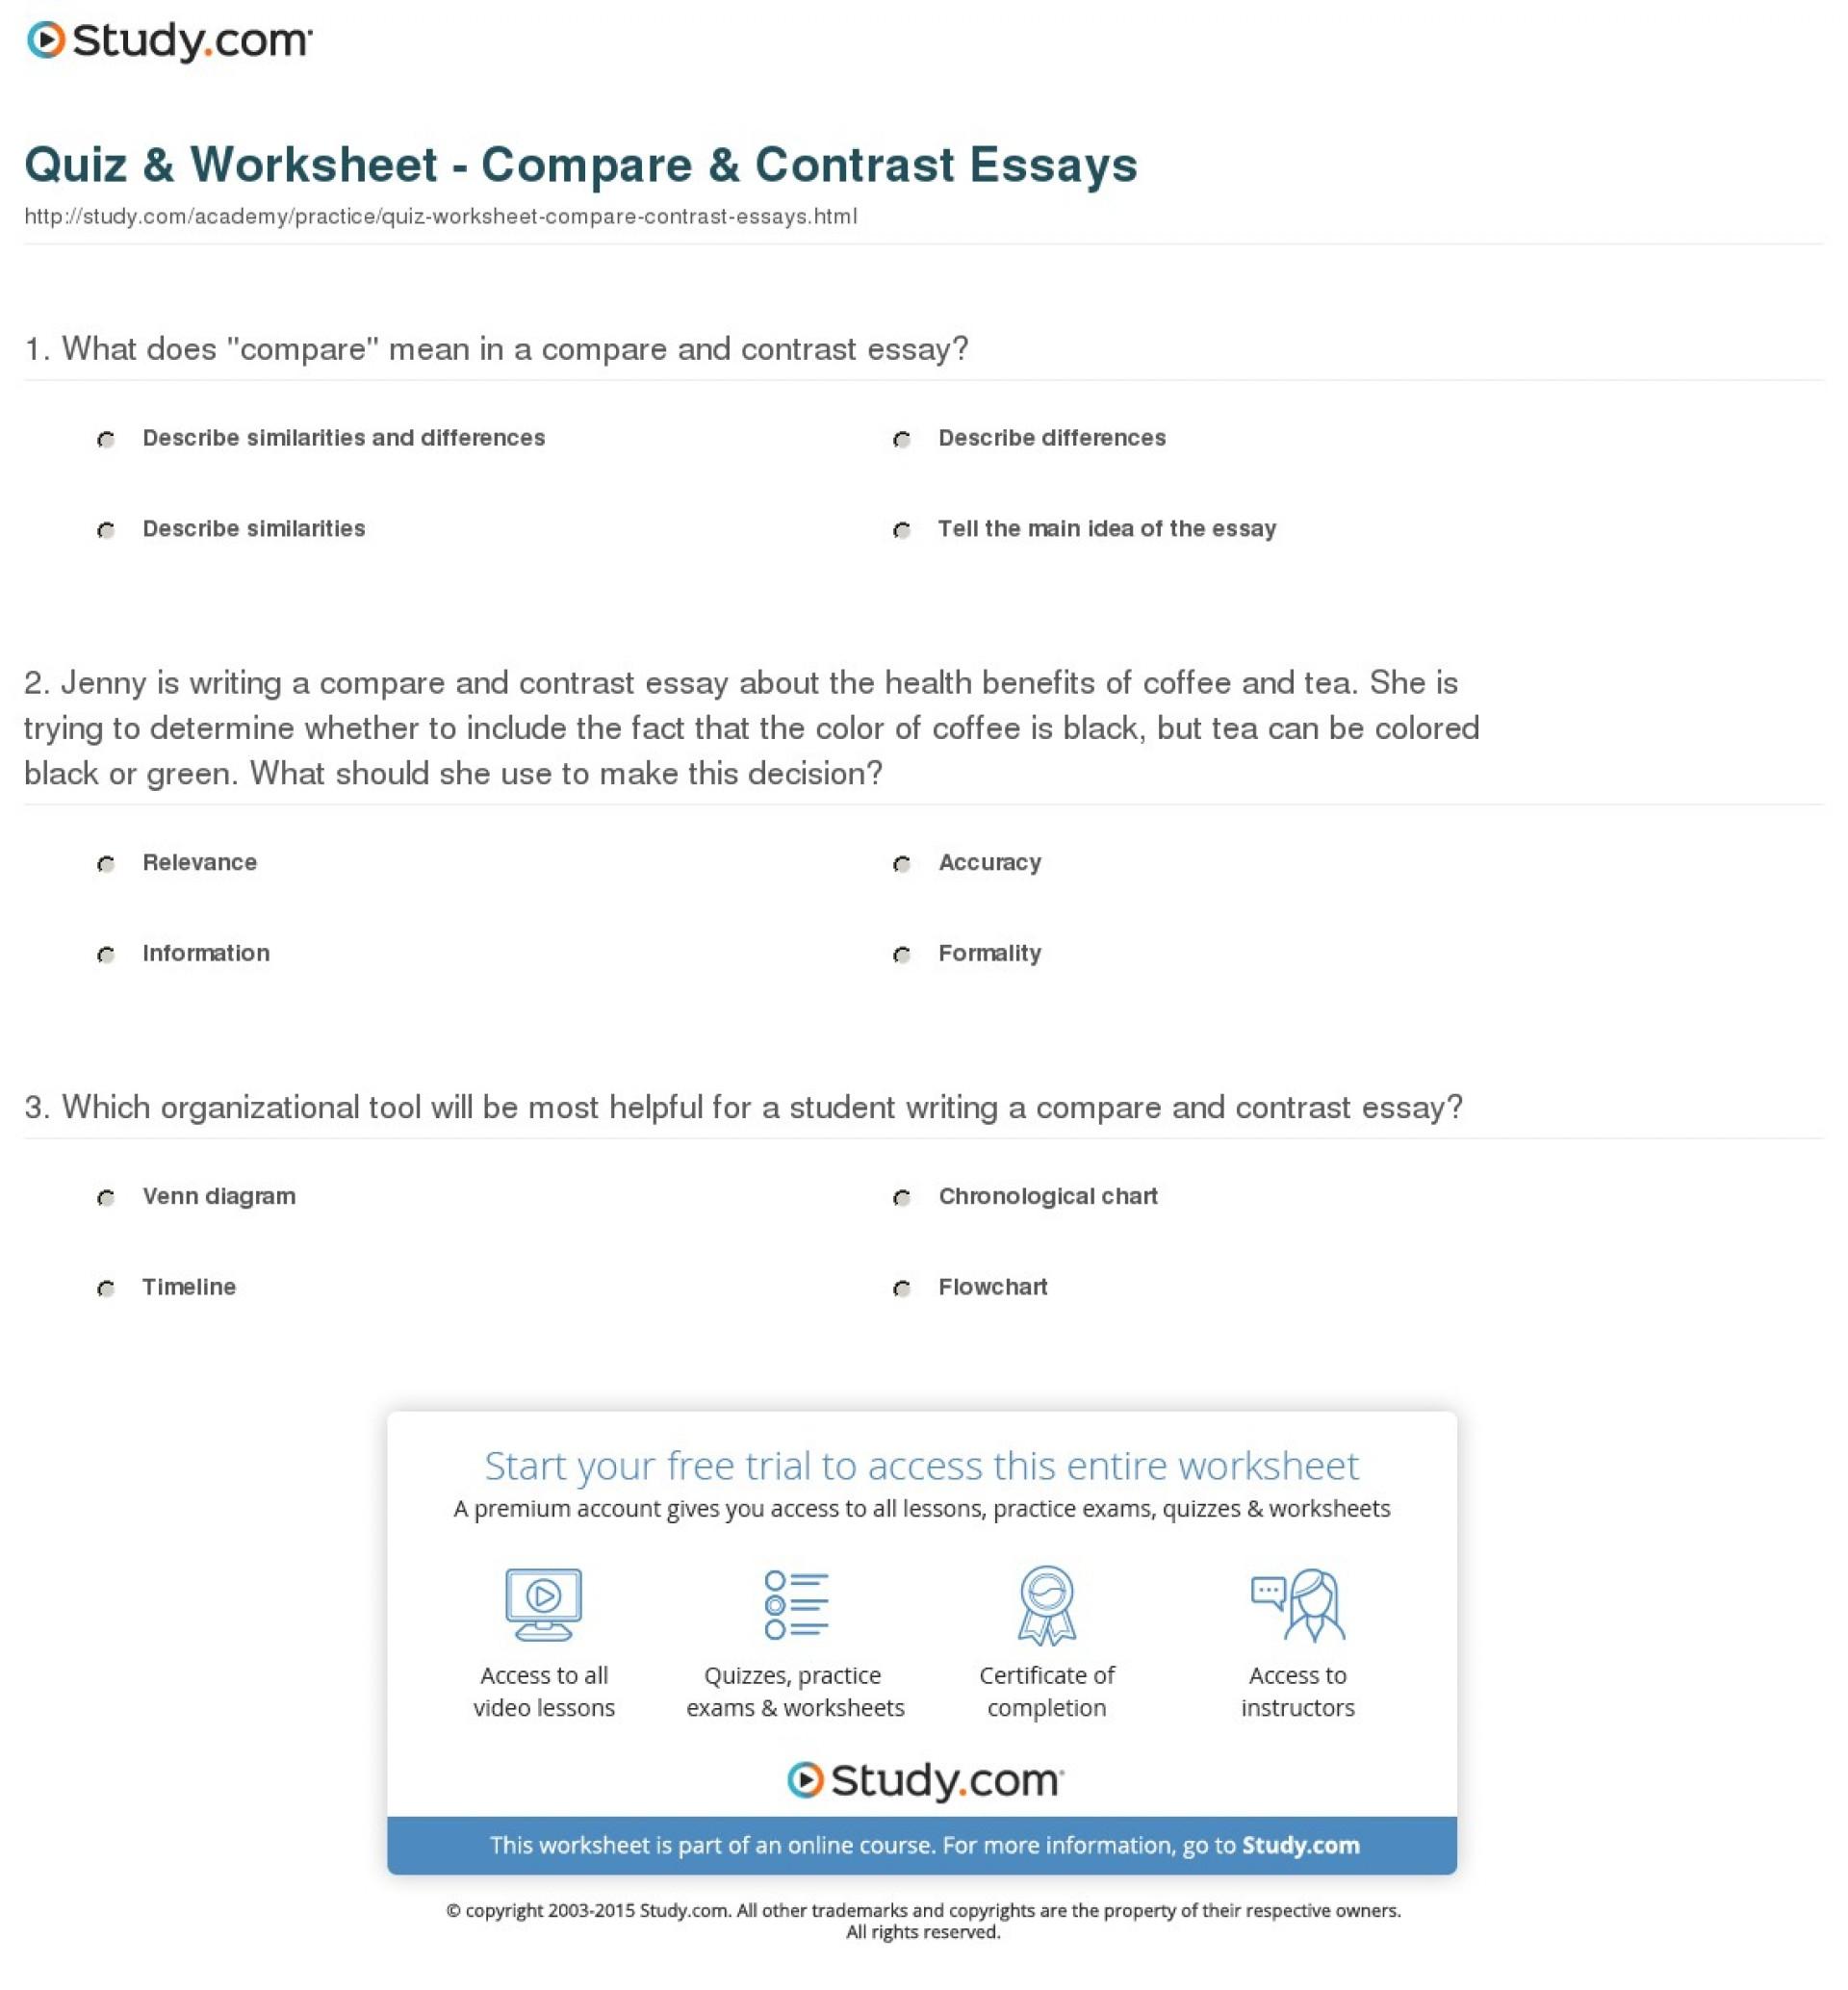 016 Quiz Worksheet Compare Contrast Essays Essay Best And Rubric Elementary Topics Toefl 6th Grade 1920